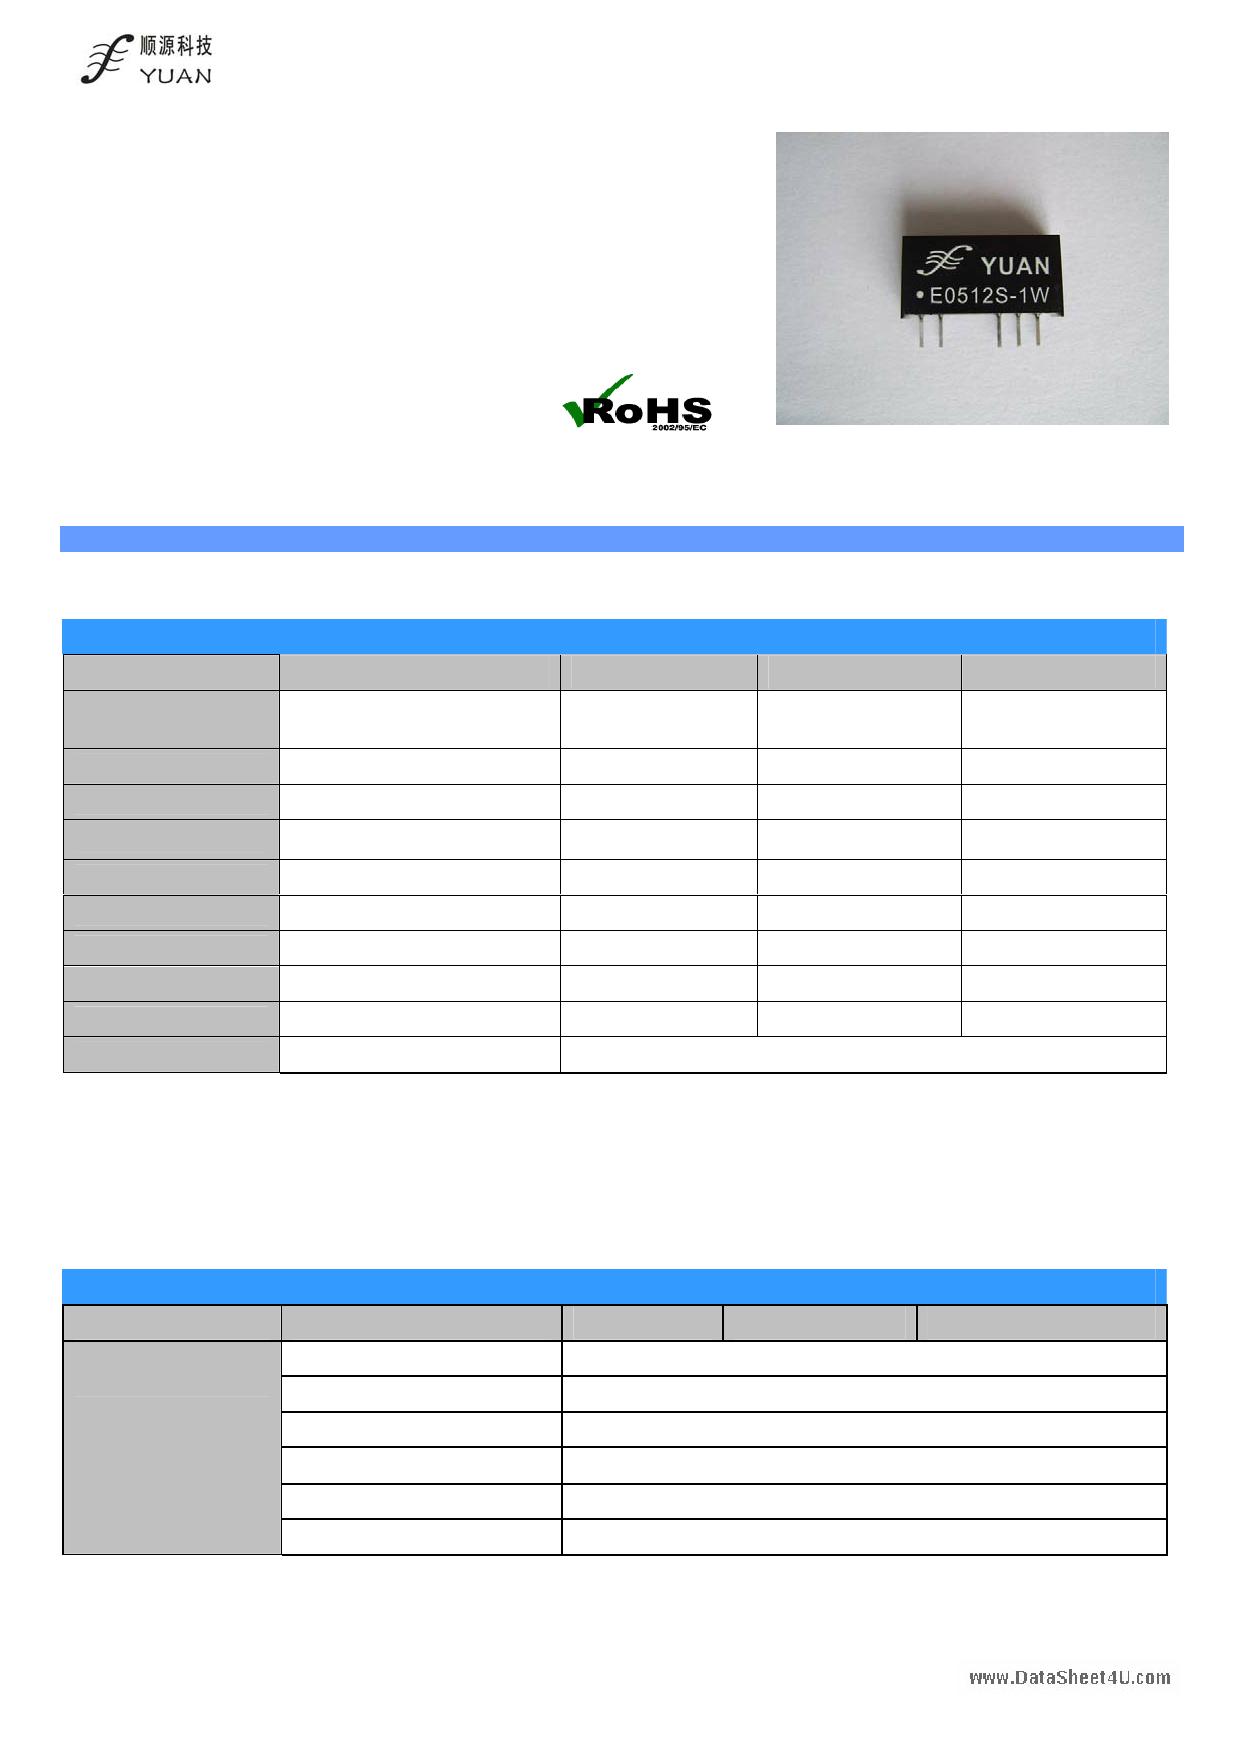 E12xxD-1W دیتاشیت PDF